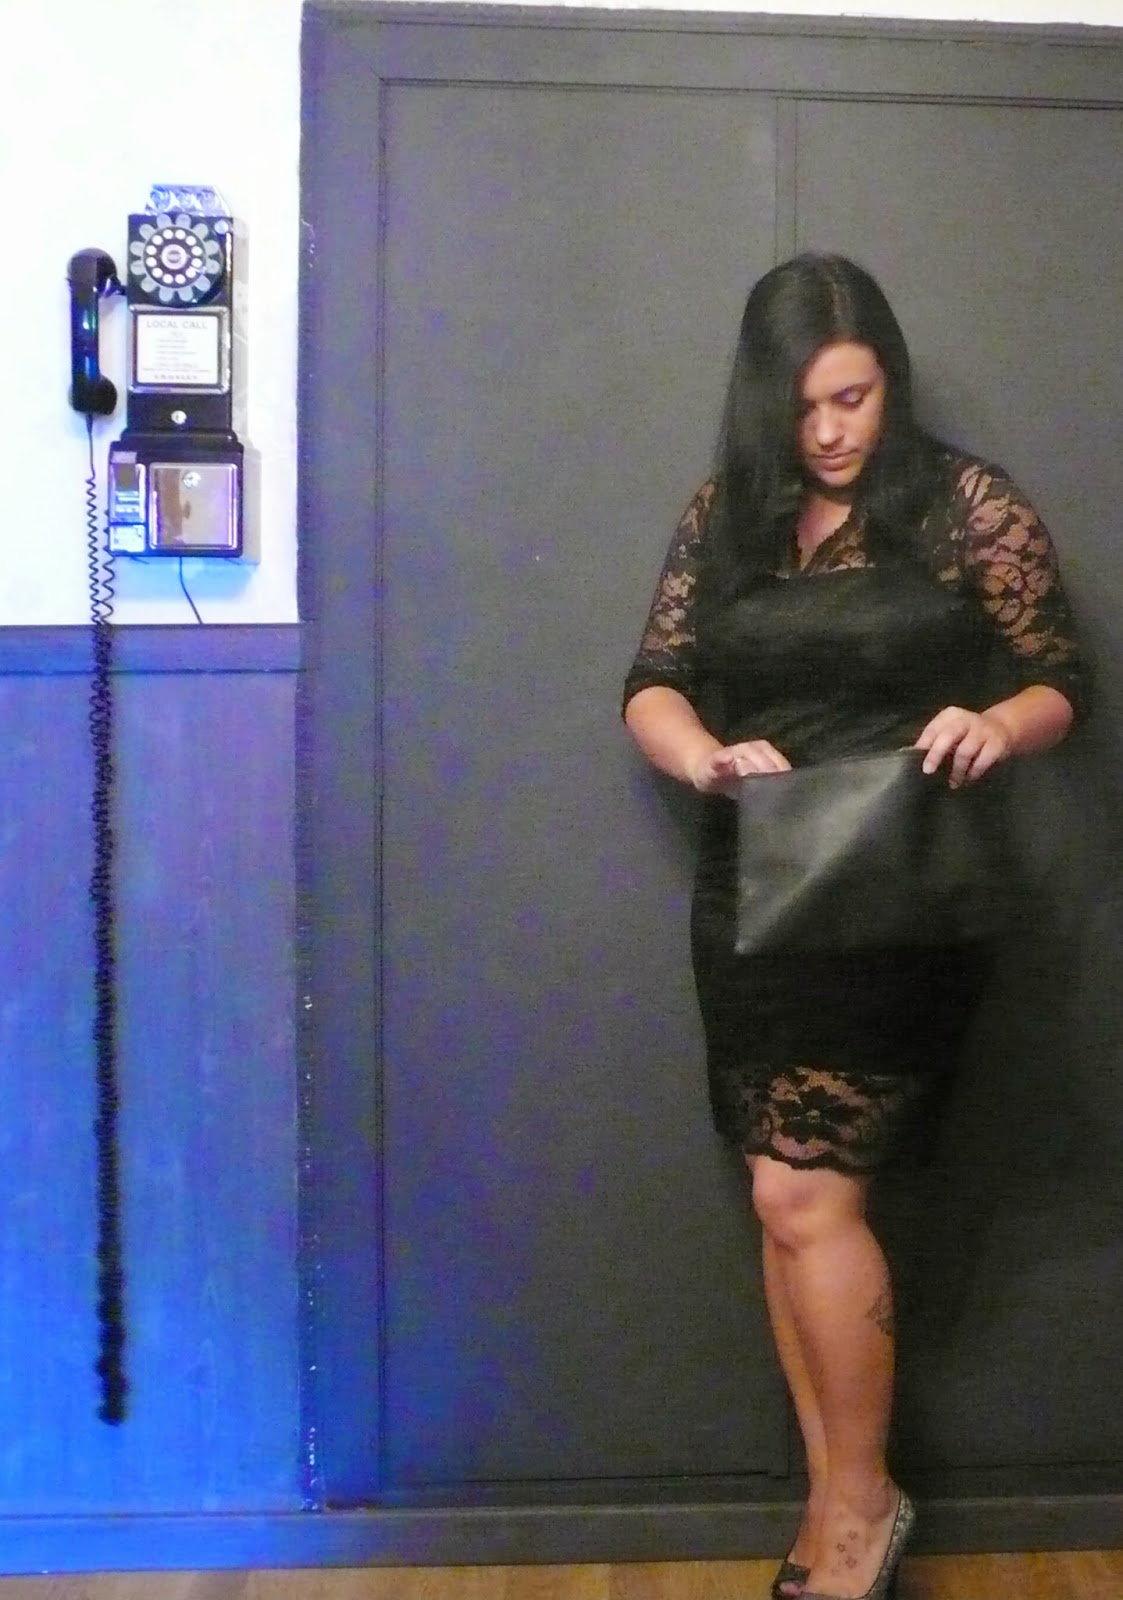 http://www.oasap.com/dresses/41276-slim-bodycon-lace-dress.html?fuid=98518